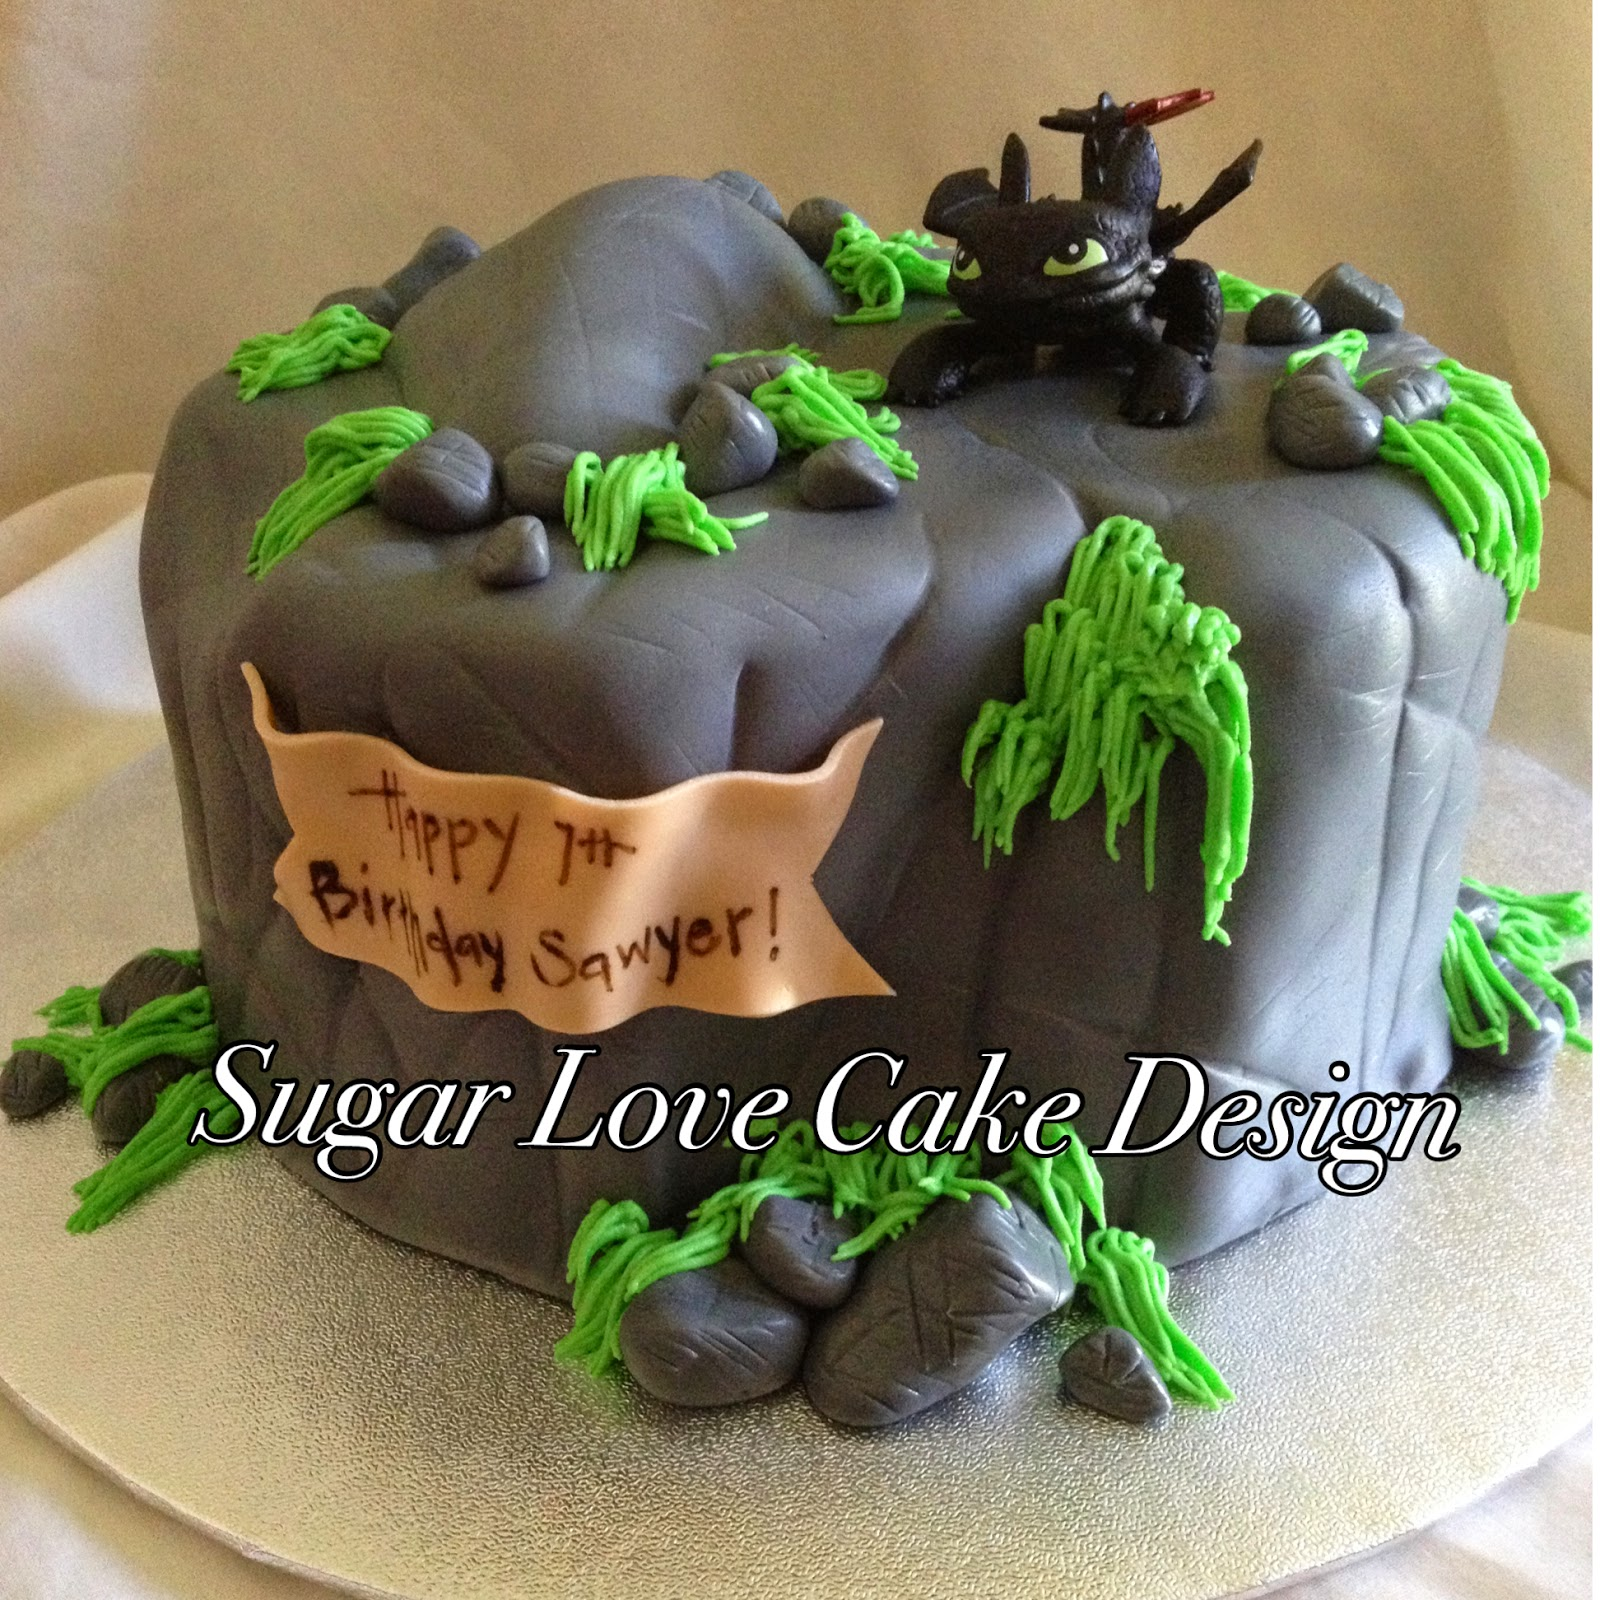 Sugar love cake design birthday cakes how to train your dragon ccuart Choice Image